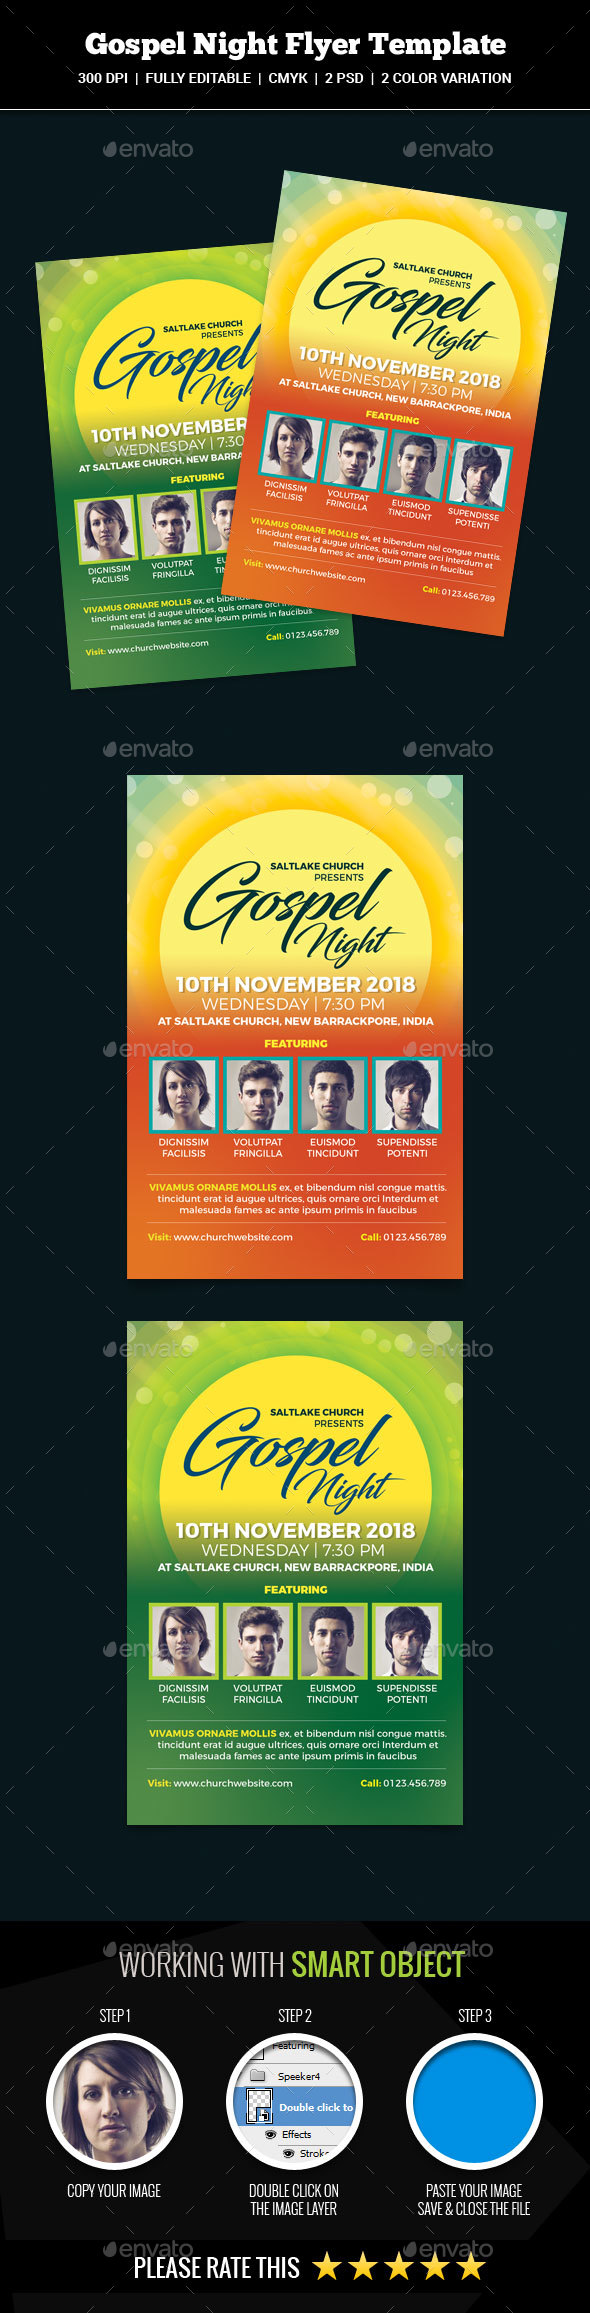 Gospel Night Flyer - Church Flyers